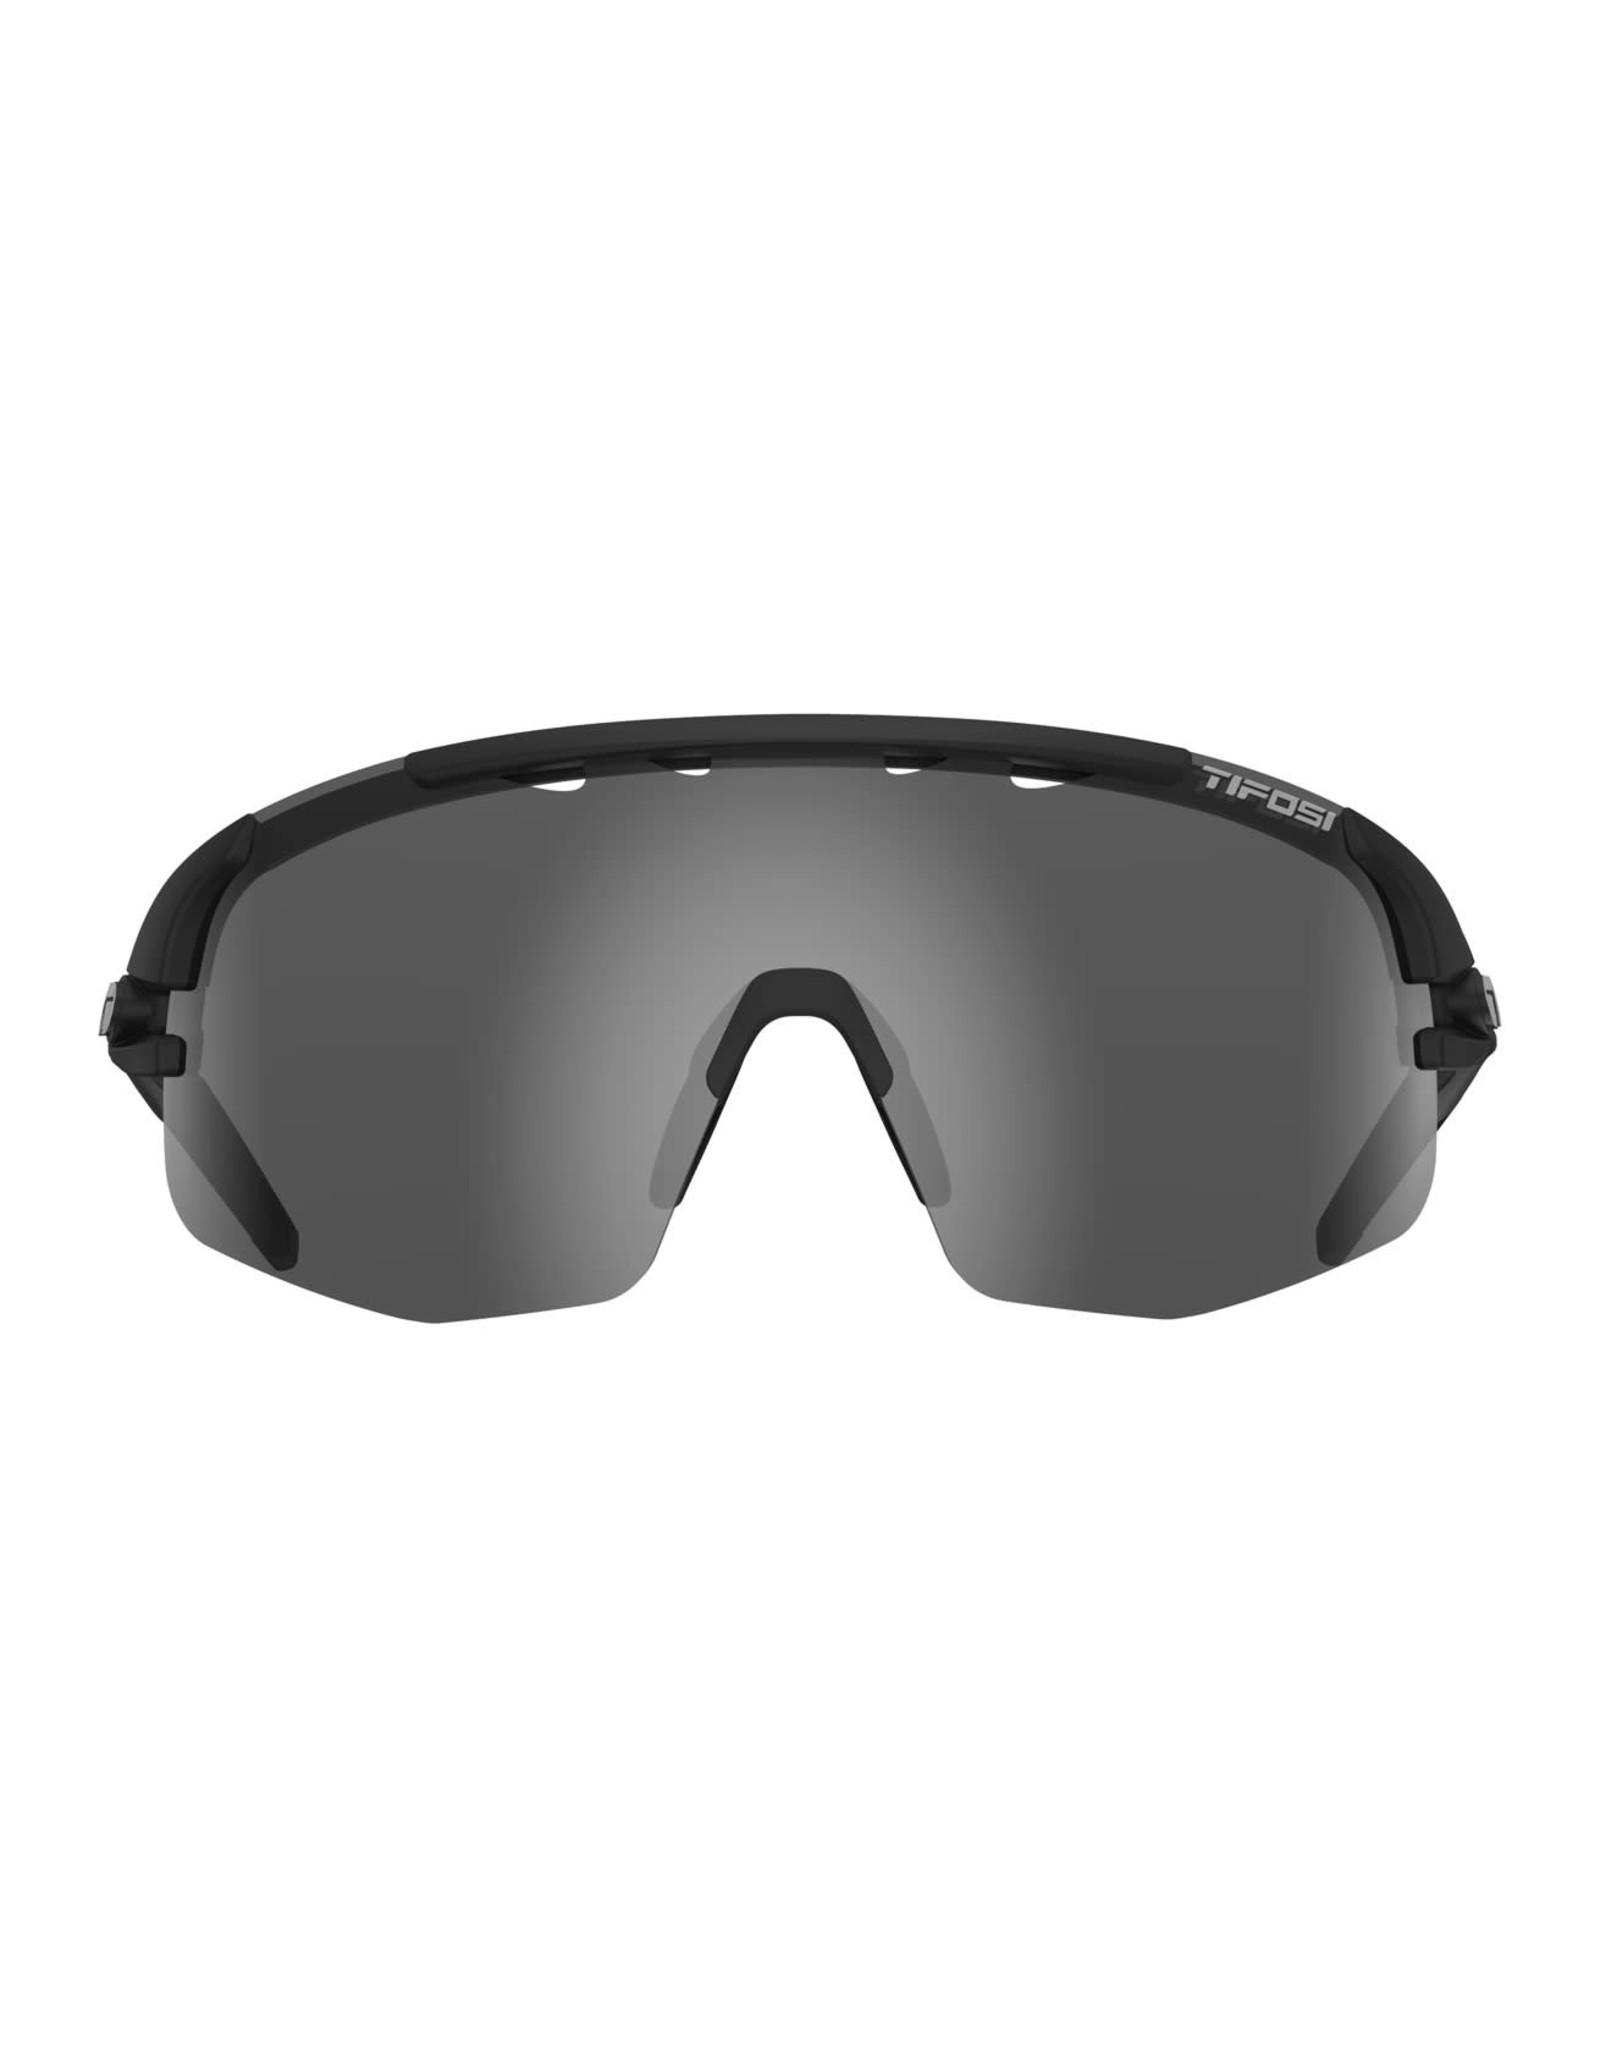 Tifosi Sledge Lite Interchangeable Cycling Sunglasses